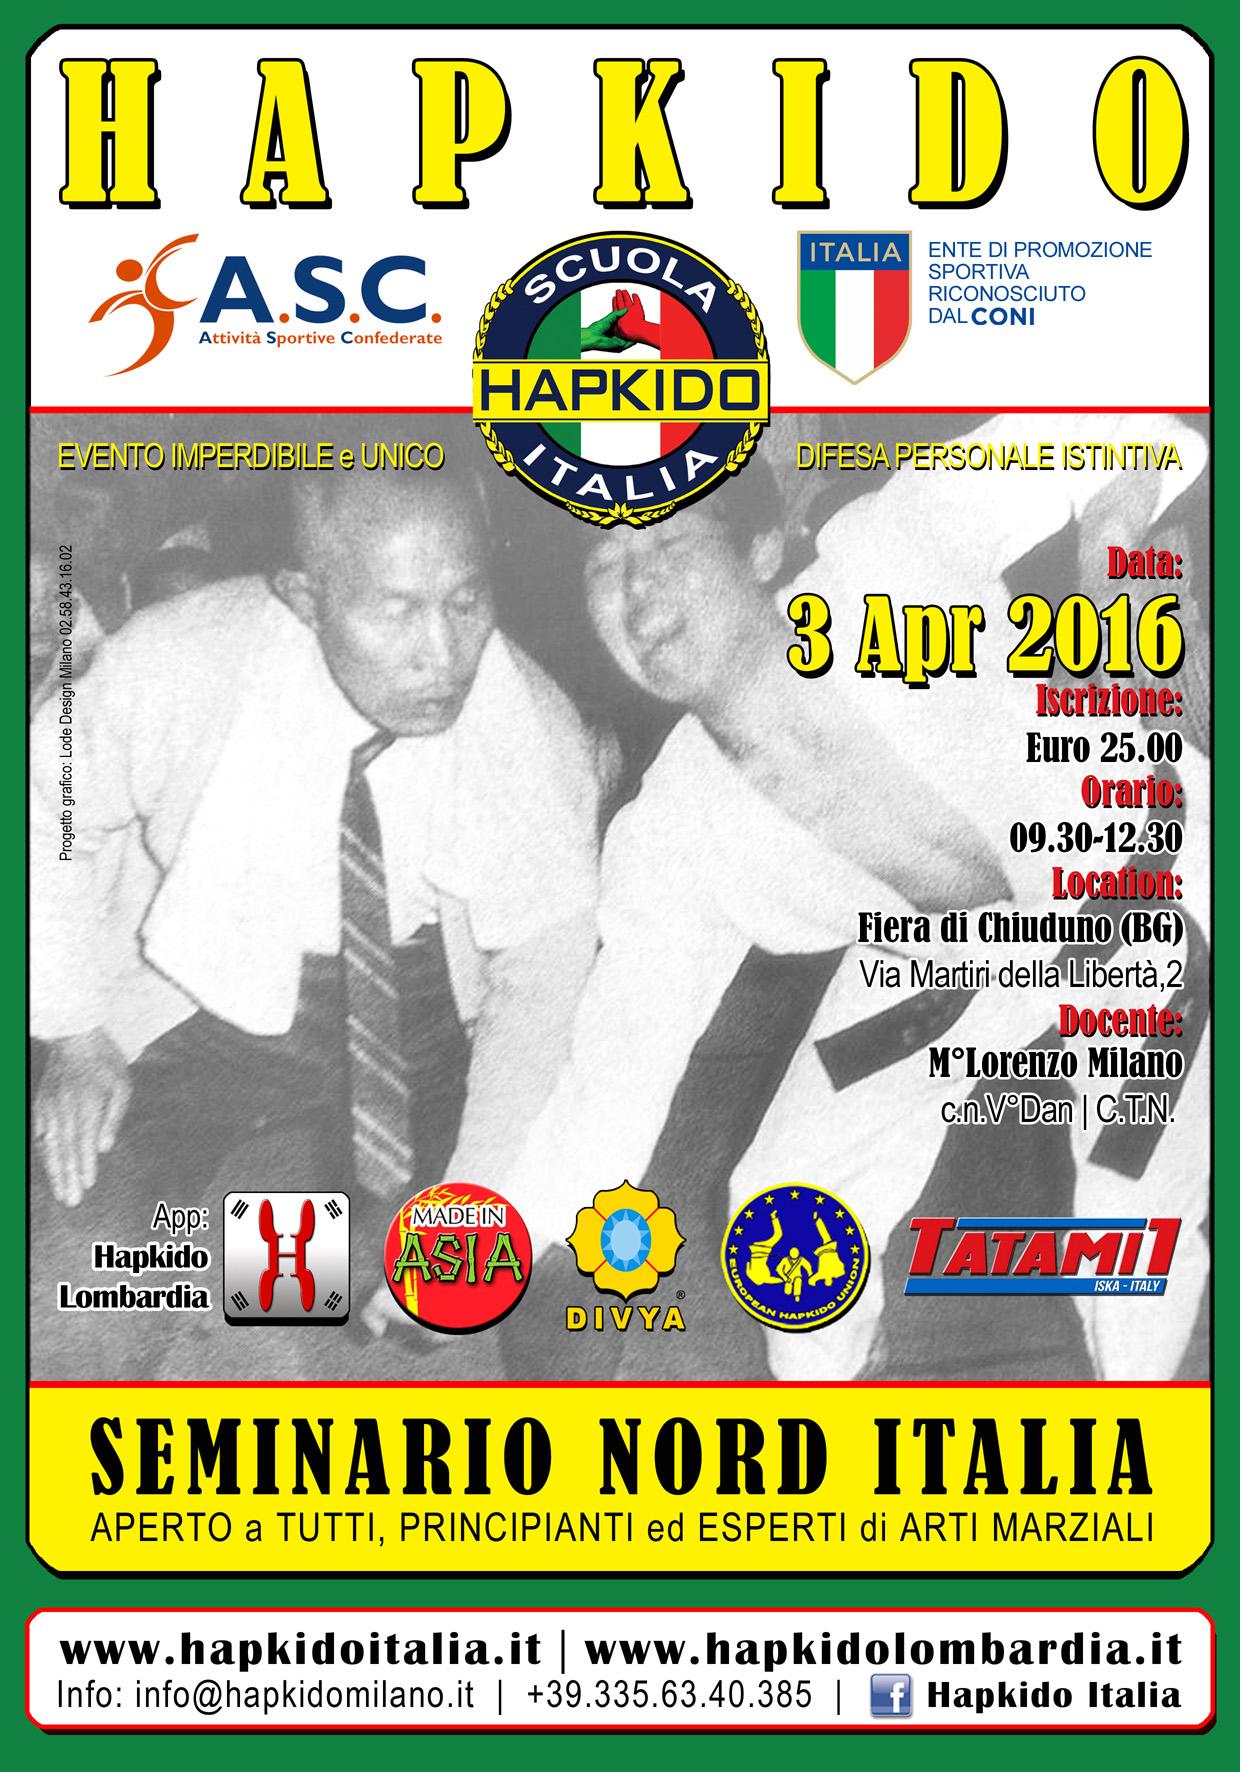 POSTER_Stage_Nord_Italia_SHAI_ChiudunoBG_3apr2016